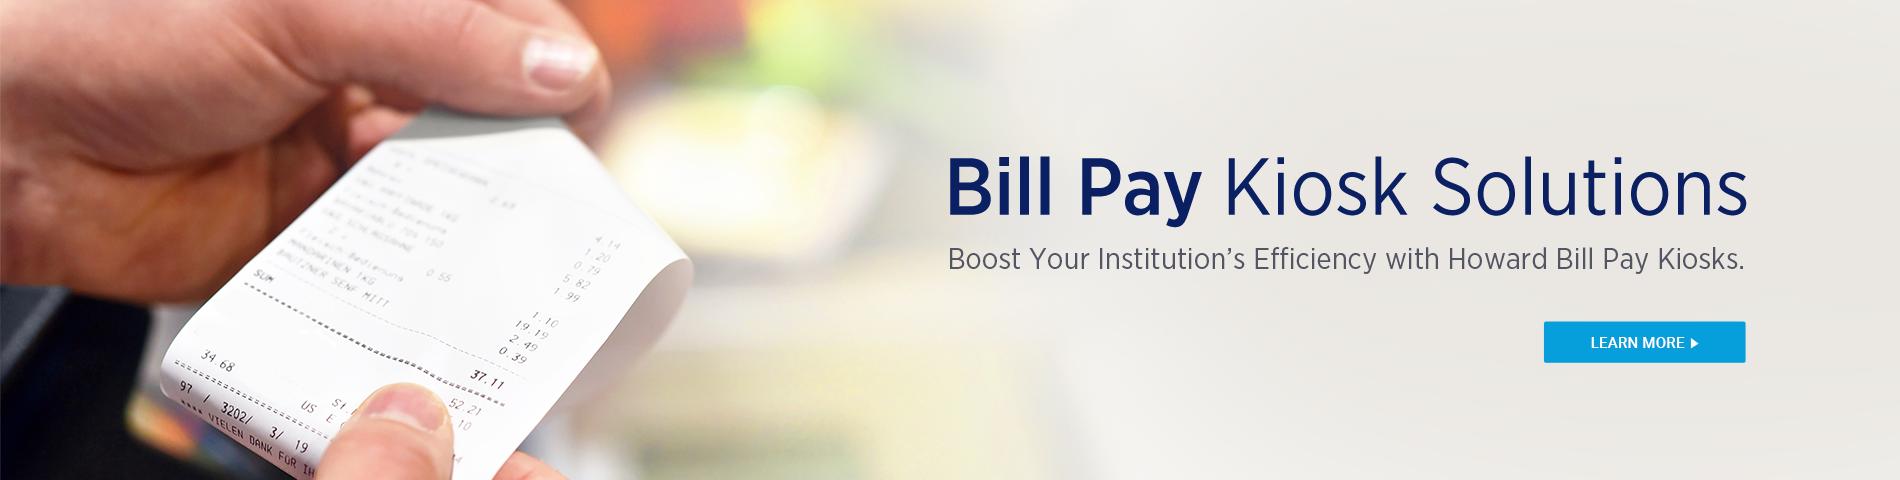 Howard Bill Pay Kiosk Solutions